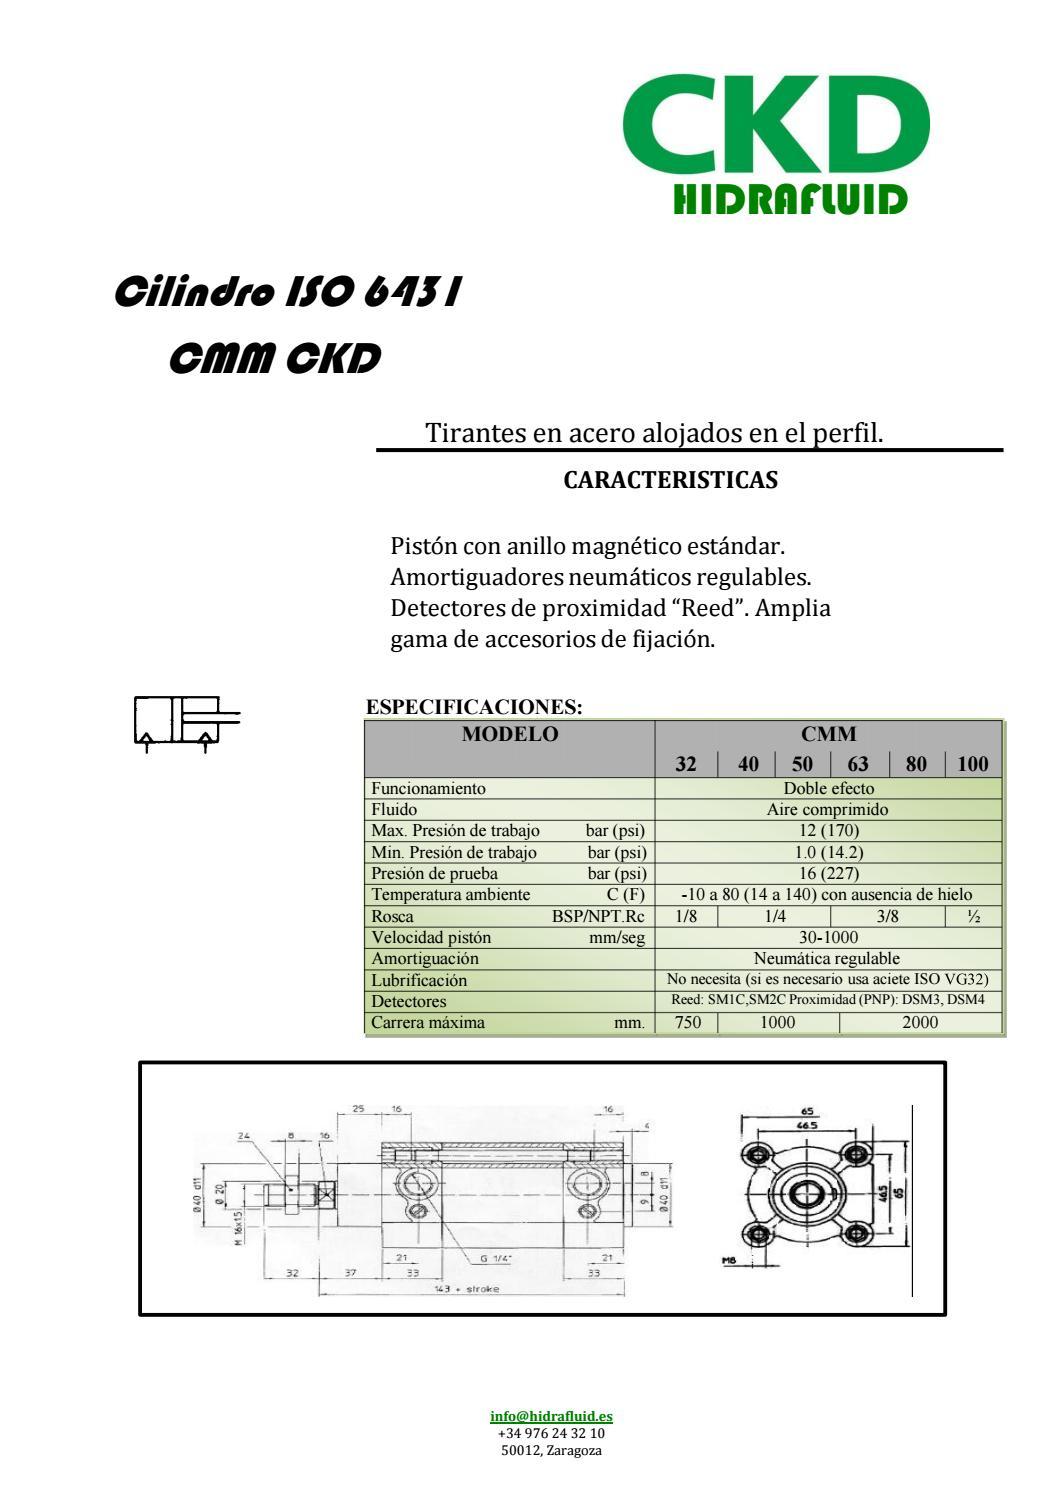 CILINDRO CMM CKD by hidrafluid - issuu